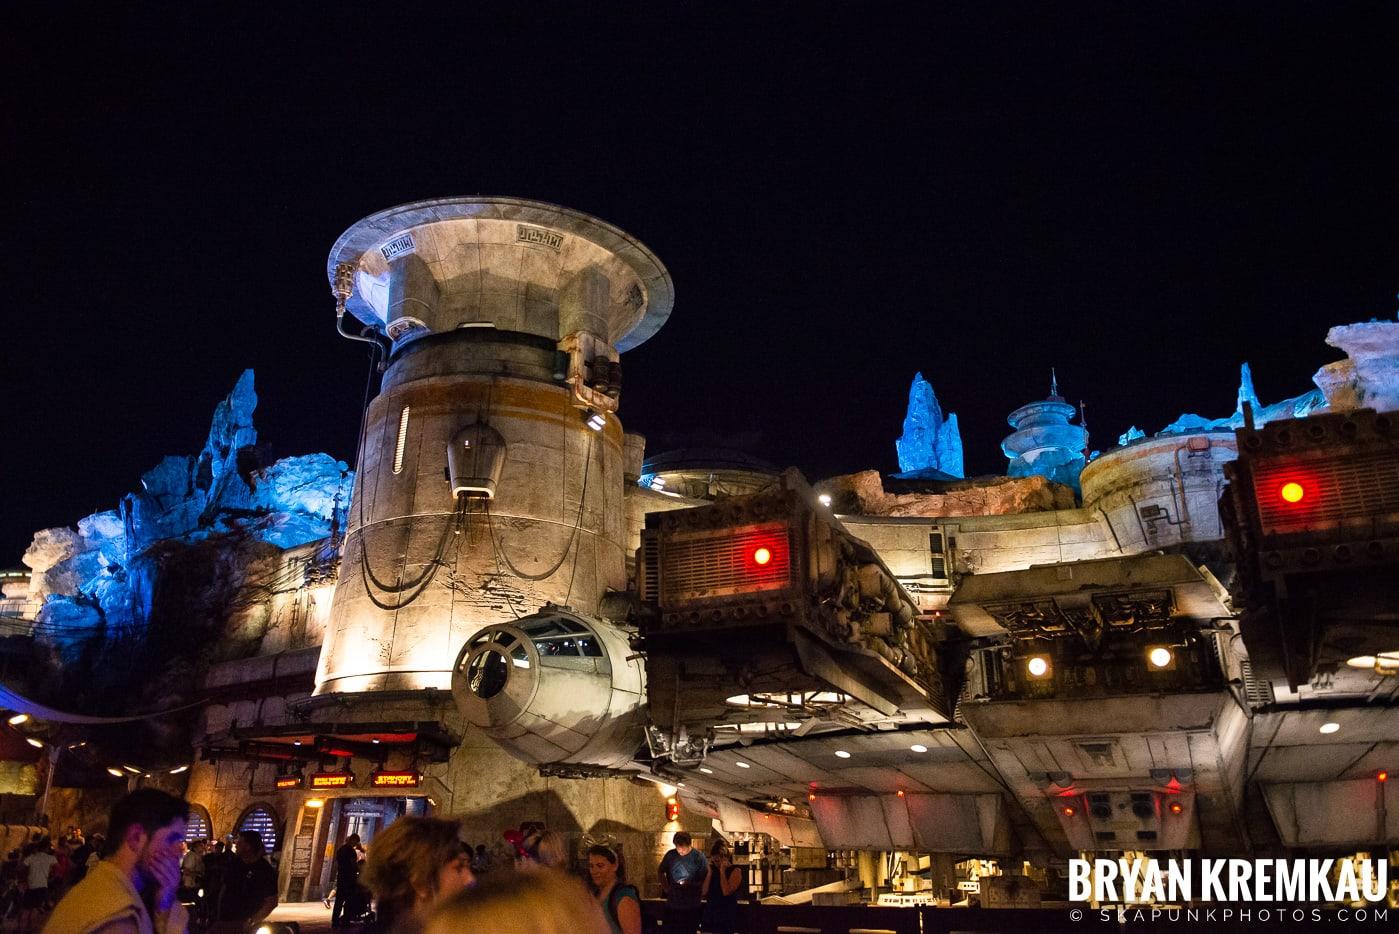 Walt Disney World Vacation: Day 6 (Magic Kingdom, Epcot, Disney's Hollywood Studios) - 10.4.19 (11)